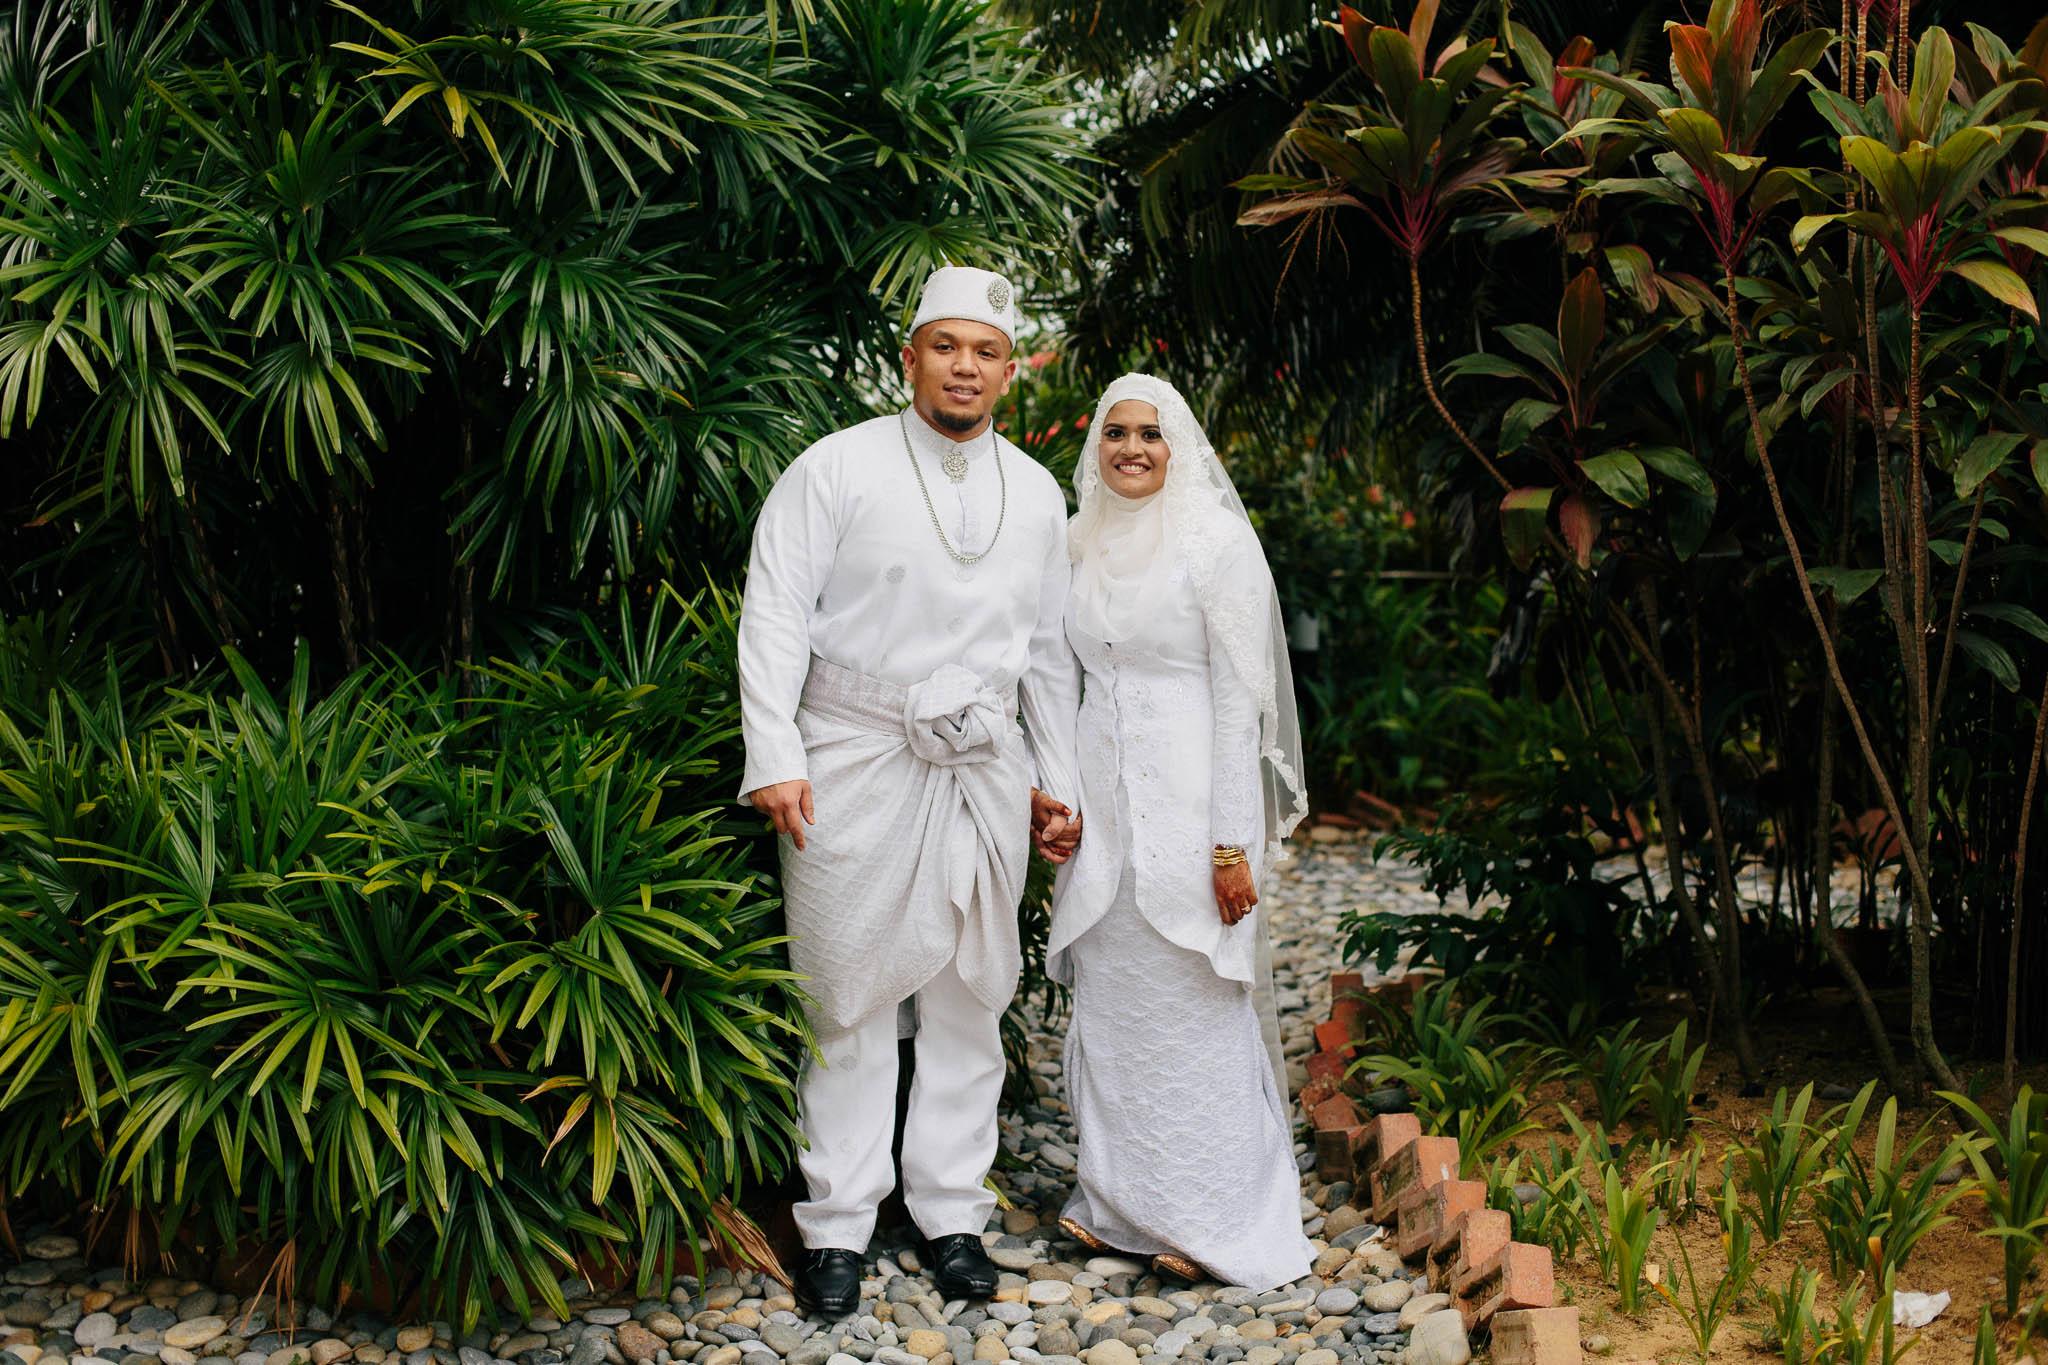 singapore-wedding-photographer-malay-indian-pre-wedding-travel-wmt-2015-shereen-farid-37.jpg